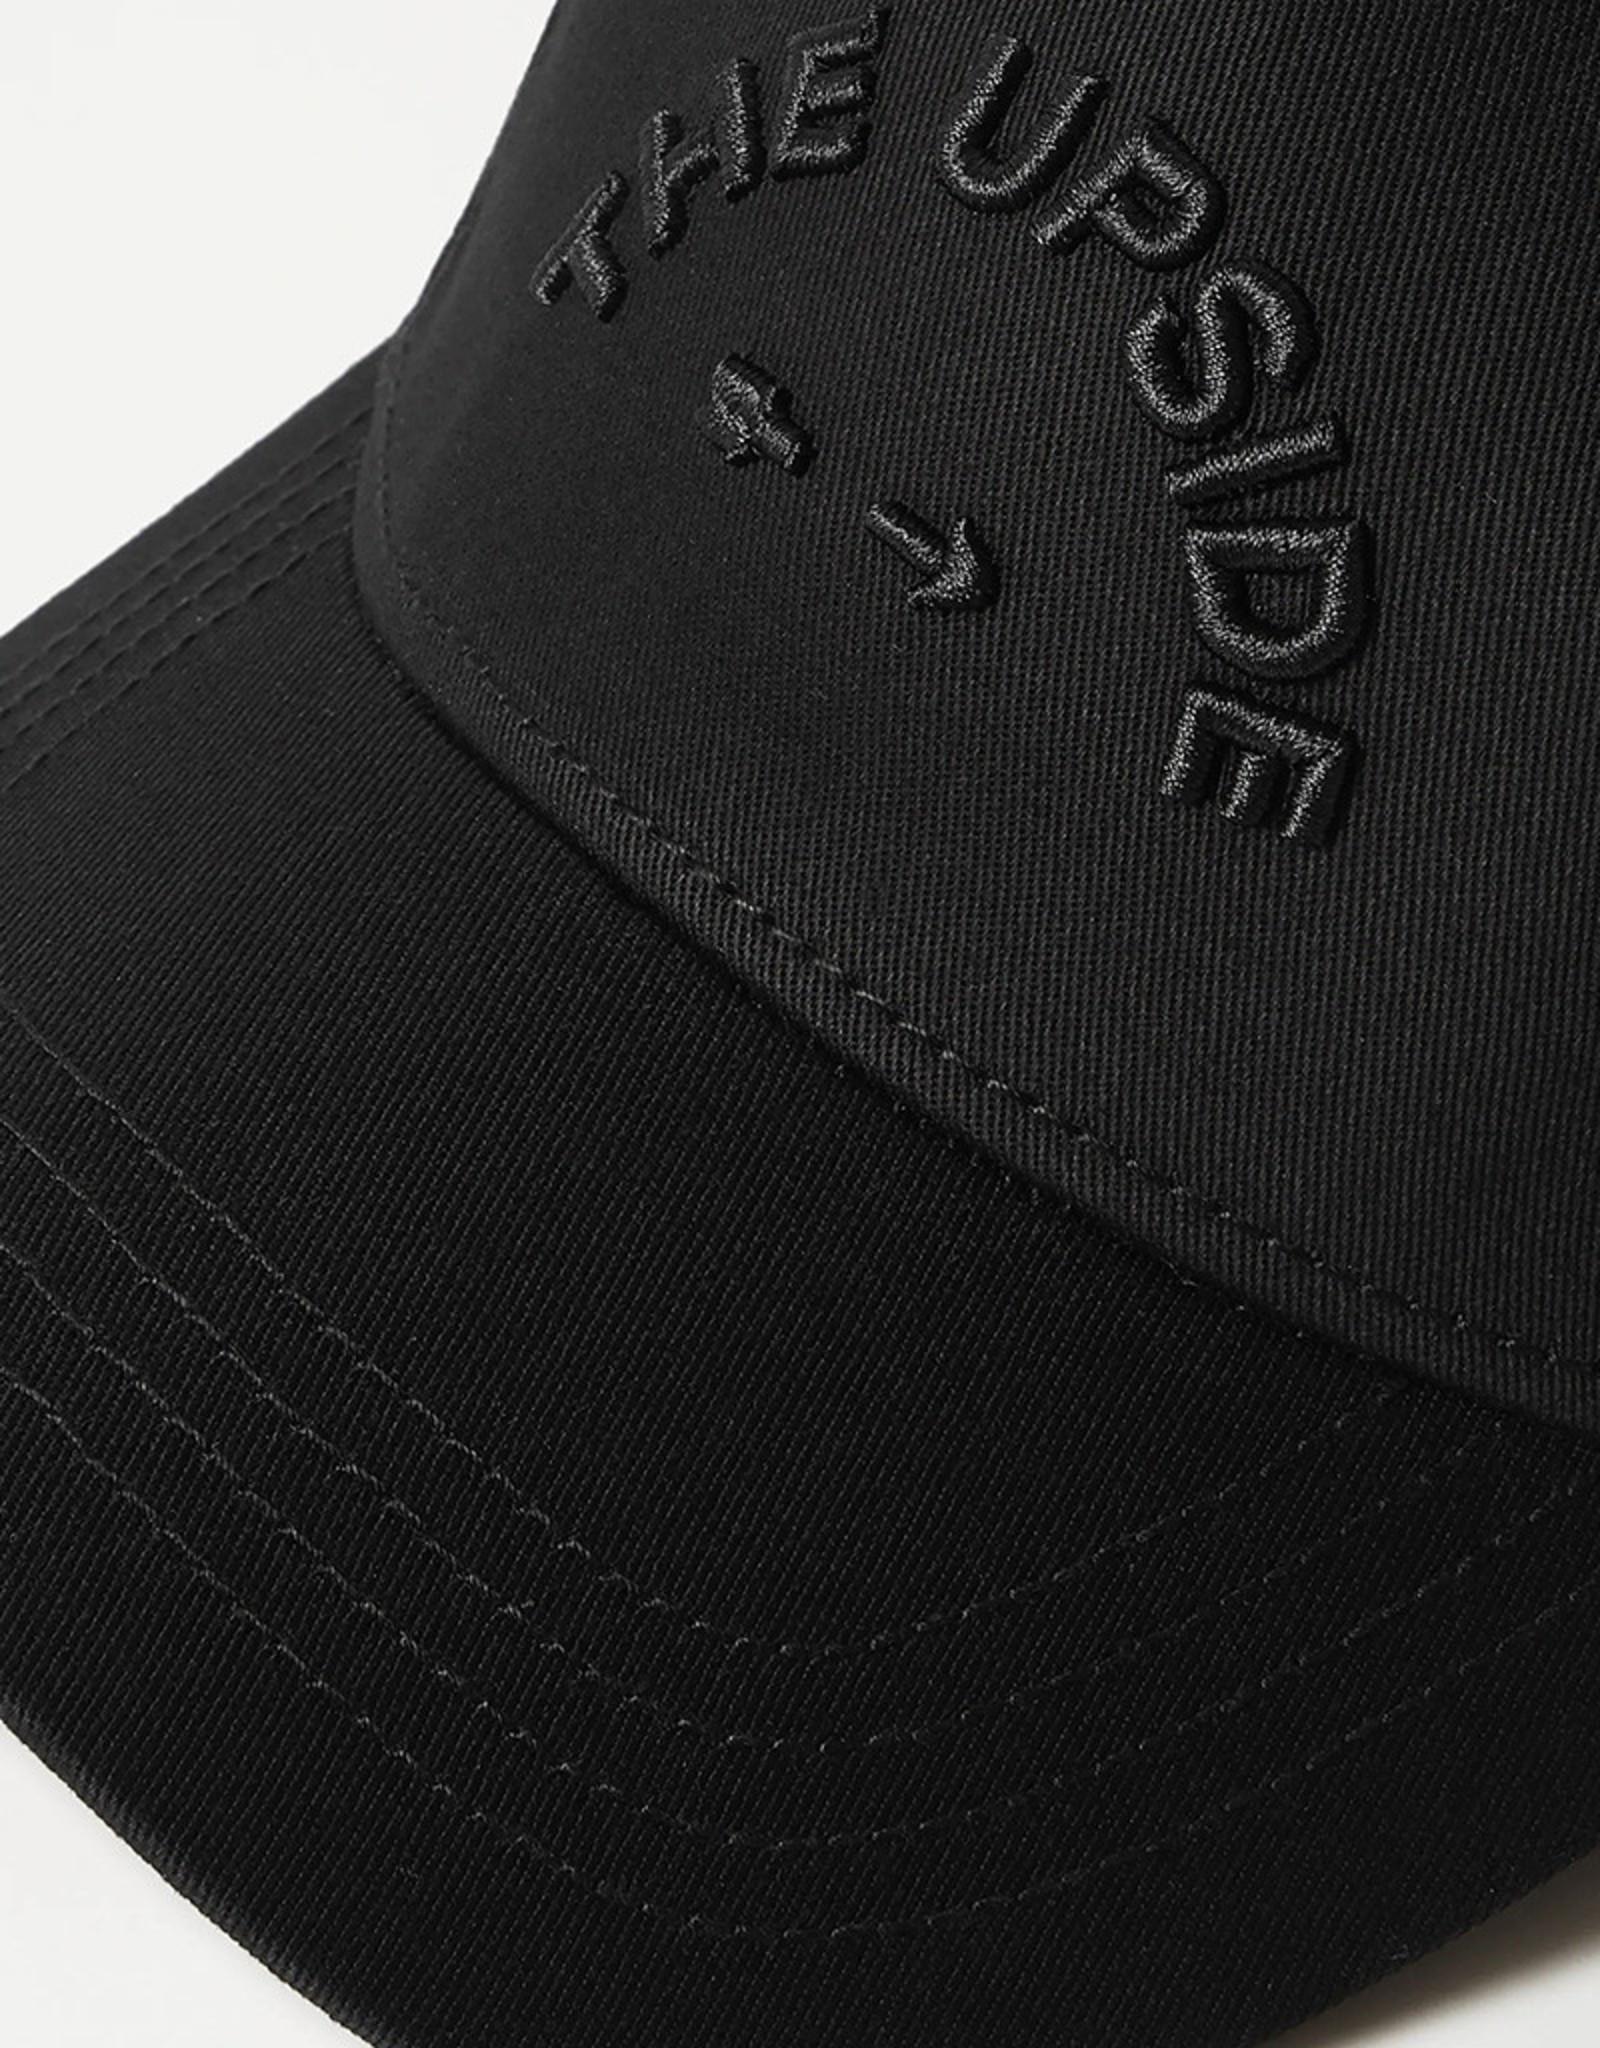 THE UPSIDE LOGO CAP